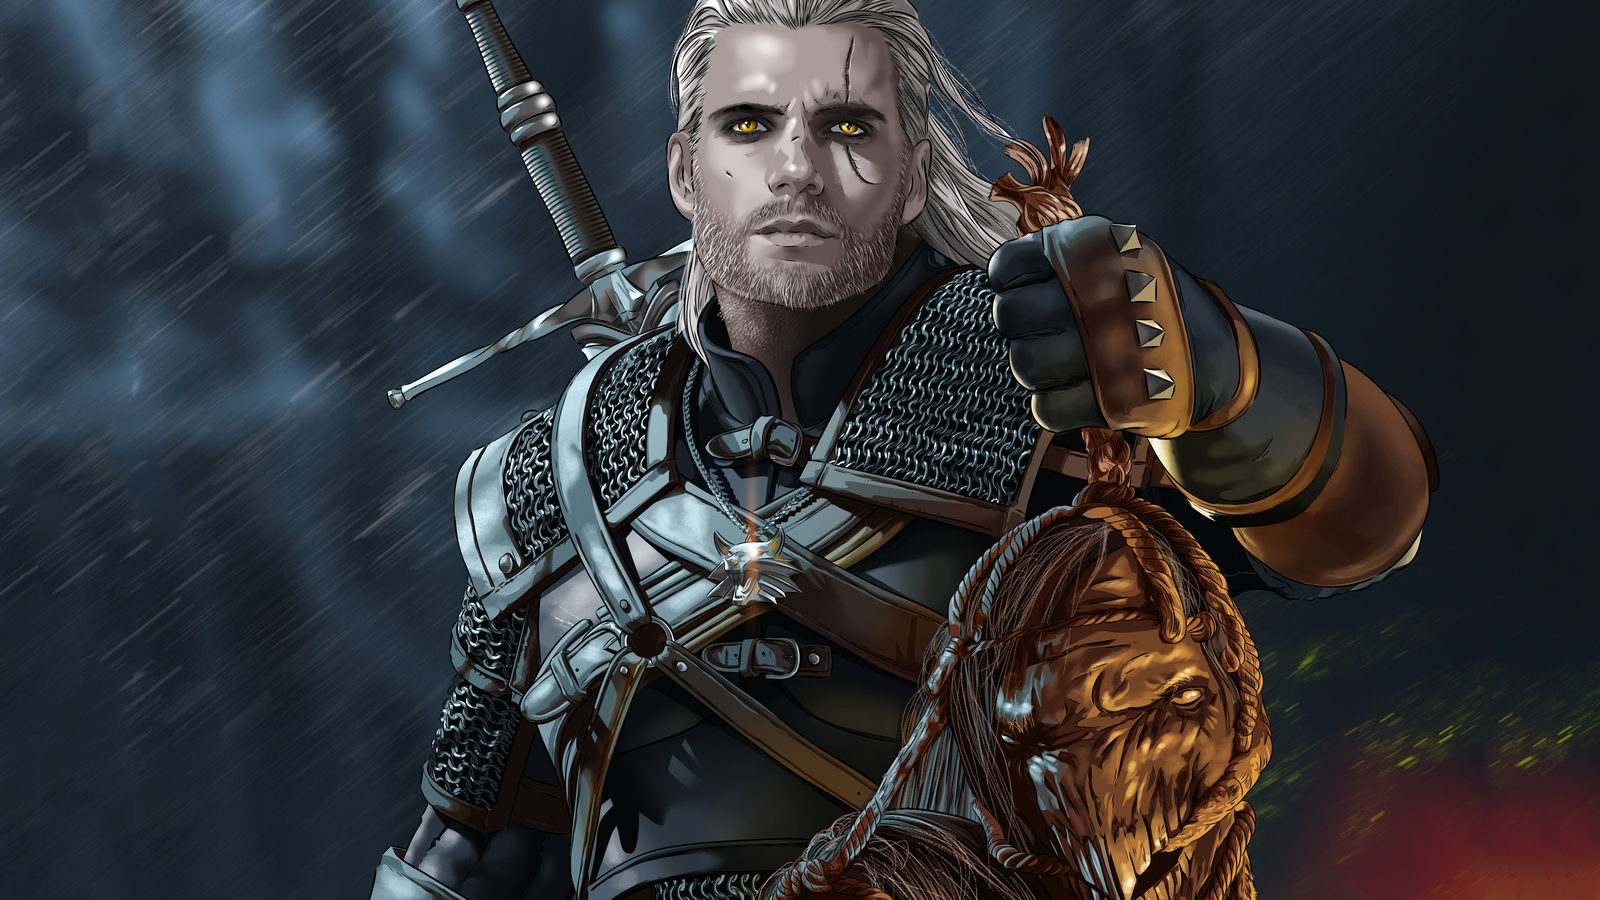 1600x900 Henry Cavill As Geralt Of Rivia 1600x900 Resolution